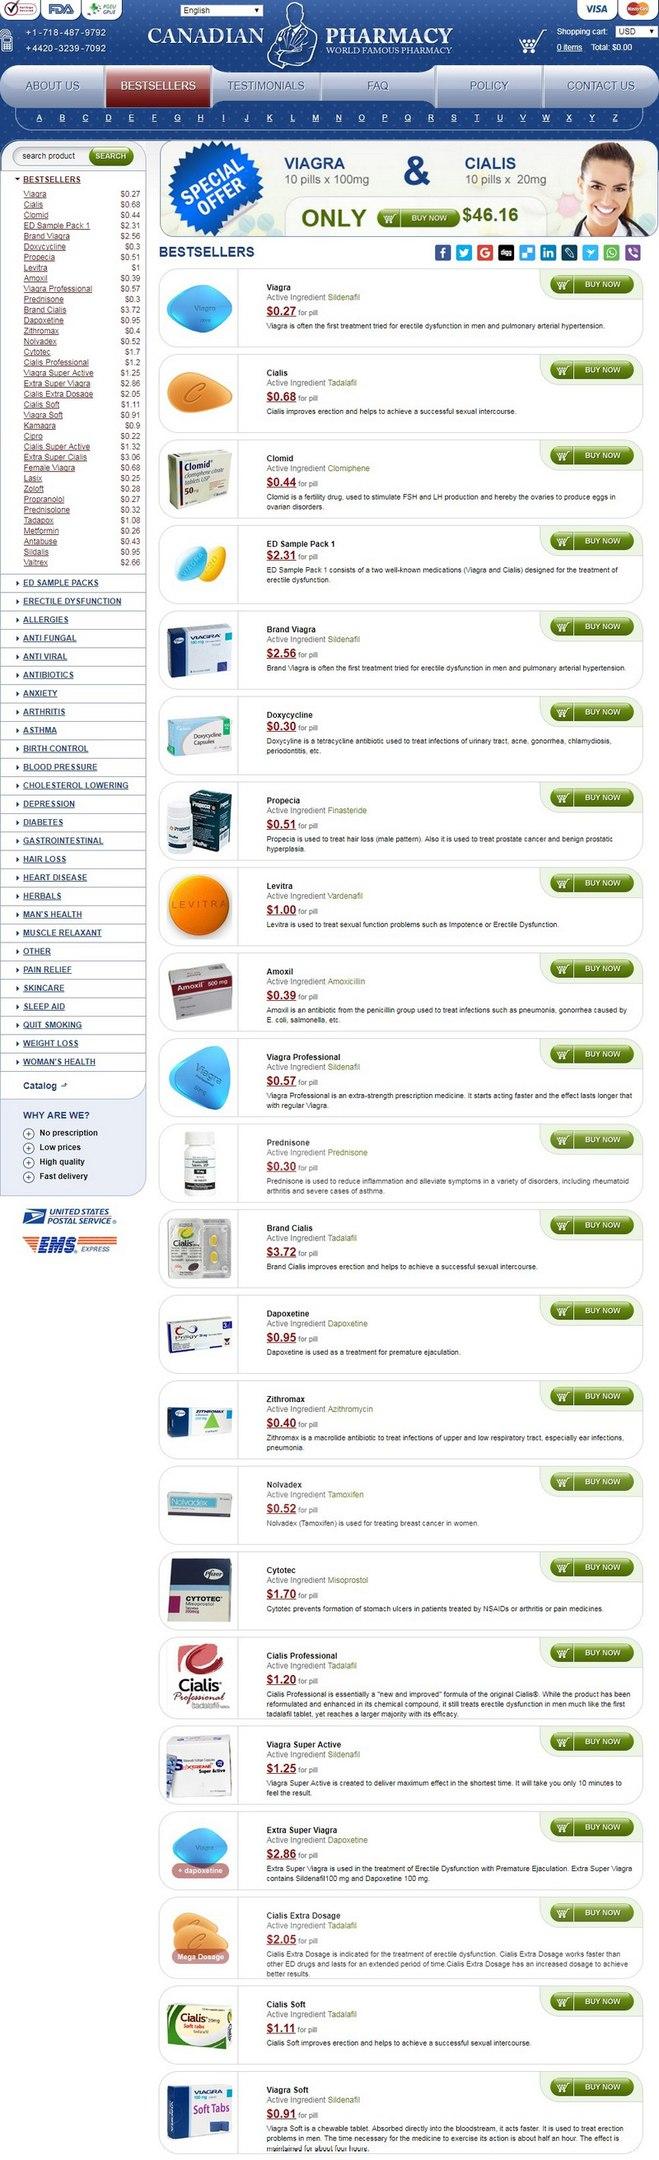 Plavix order canada.doc - Aspirin Plavix Loading Dose